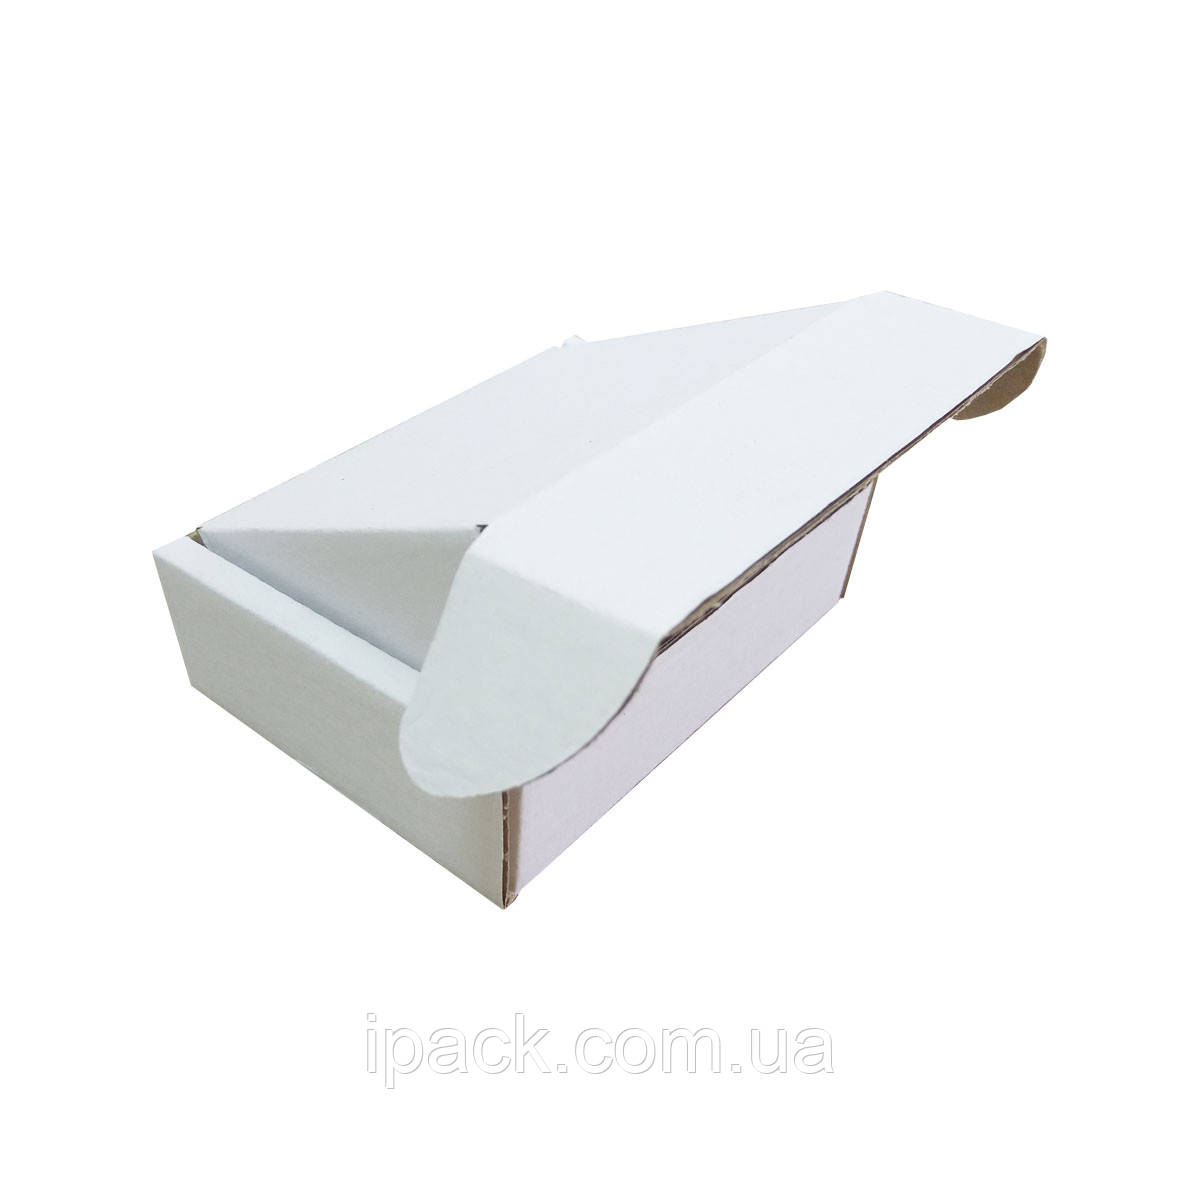 Коробка картонная самосборная, 90*90*60, мм, белая, микрогофрокартон